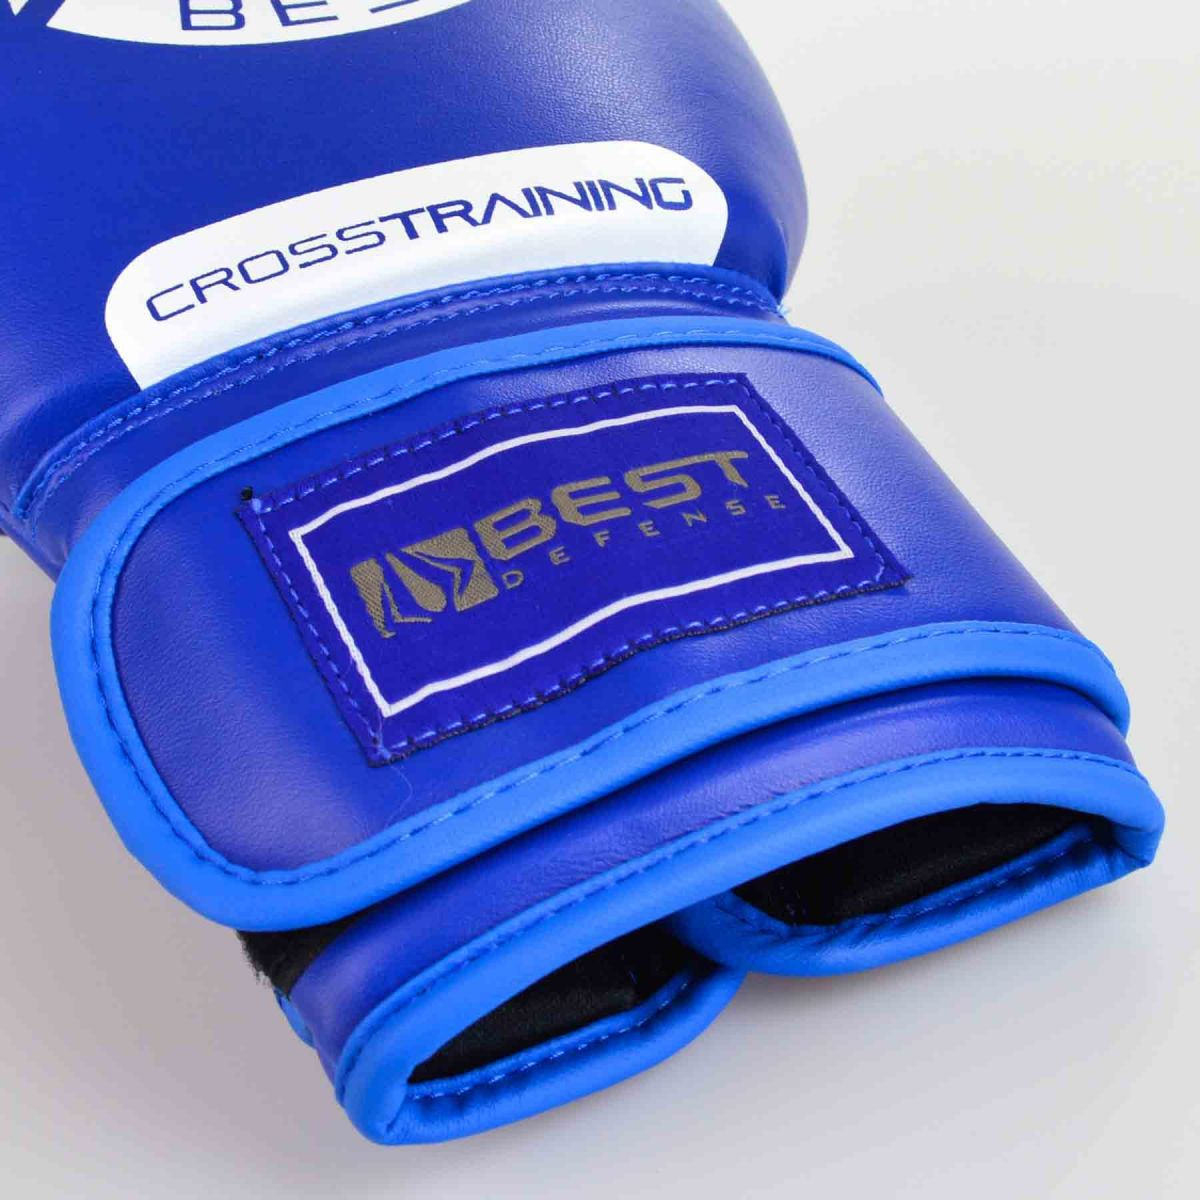 Luvas Boxe / Muay Thai - Cross Trainning- Best Defense - Azul- 10/12/14OZ .  - Loja do Competidor